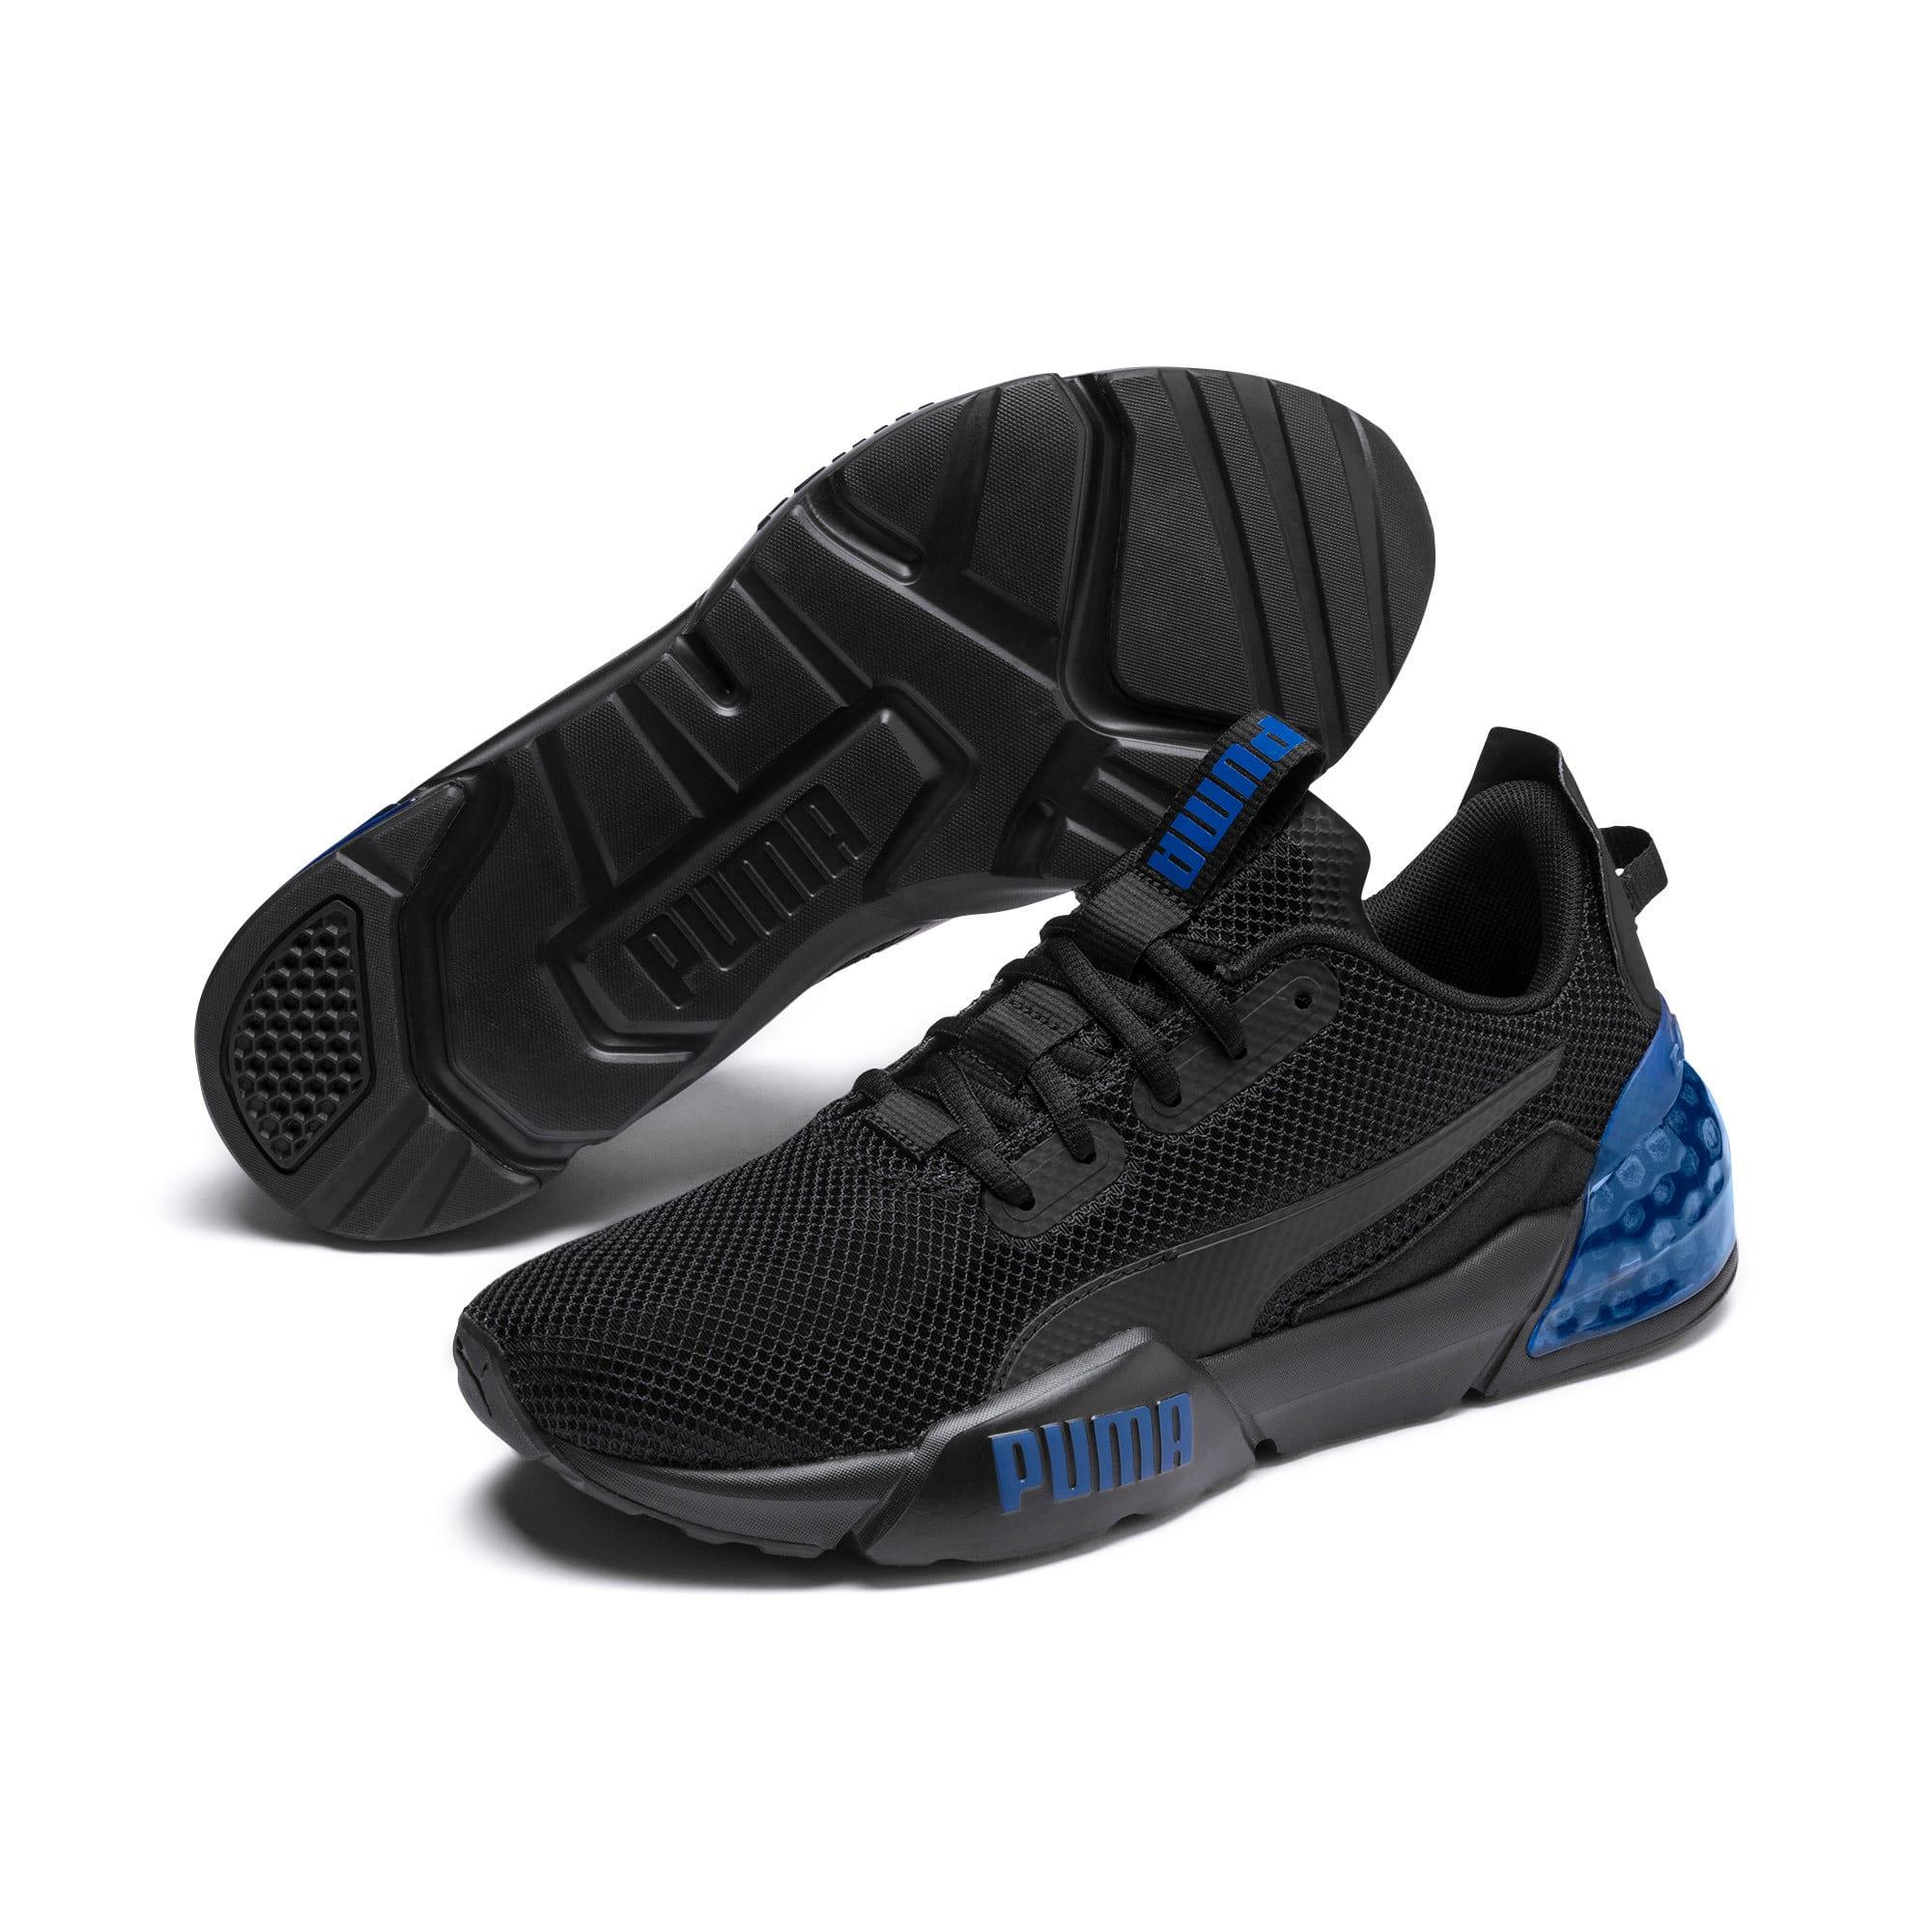 Thumbnail 3 of CELL Phase Men's Training Shoes, Puma Black-Galaxy Blue, medium